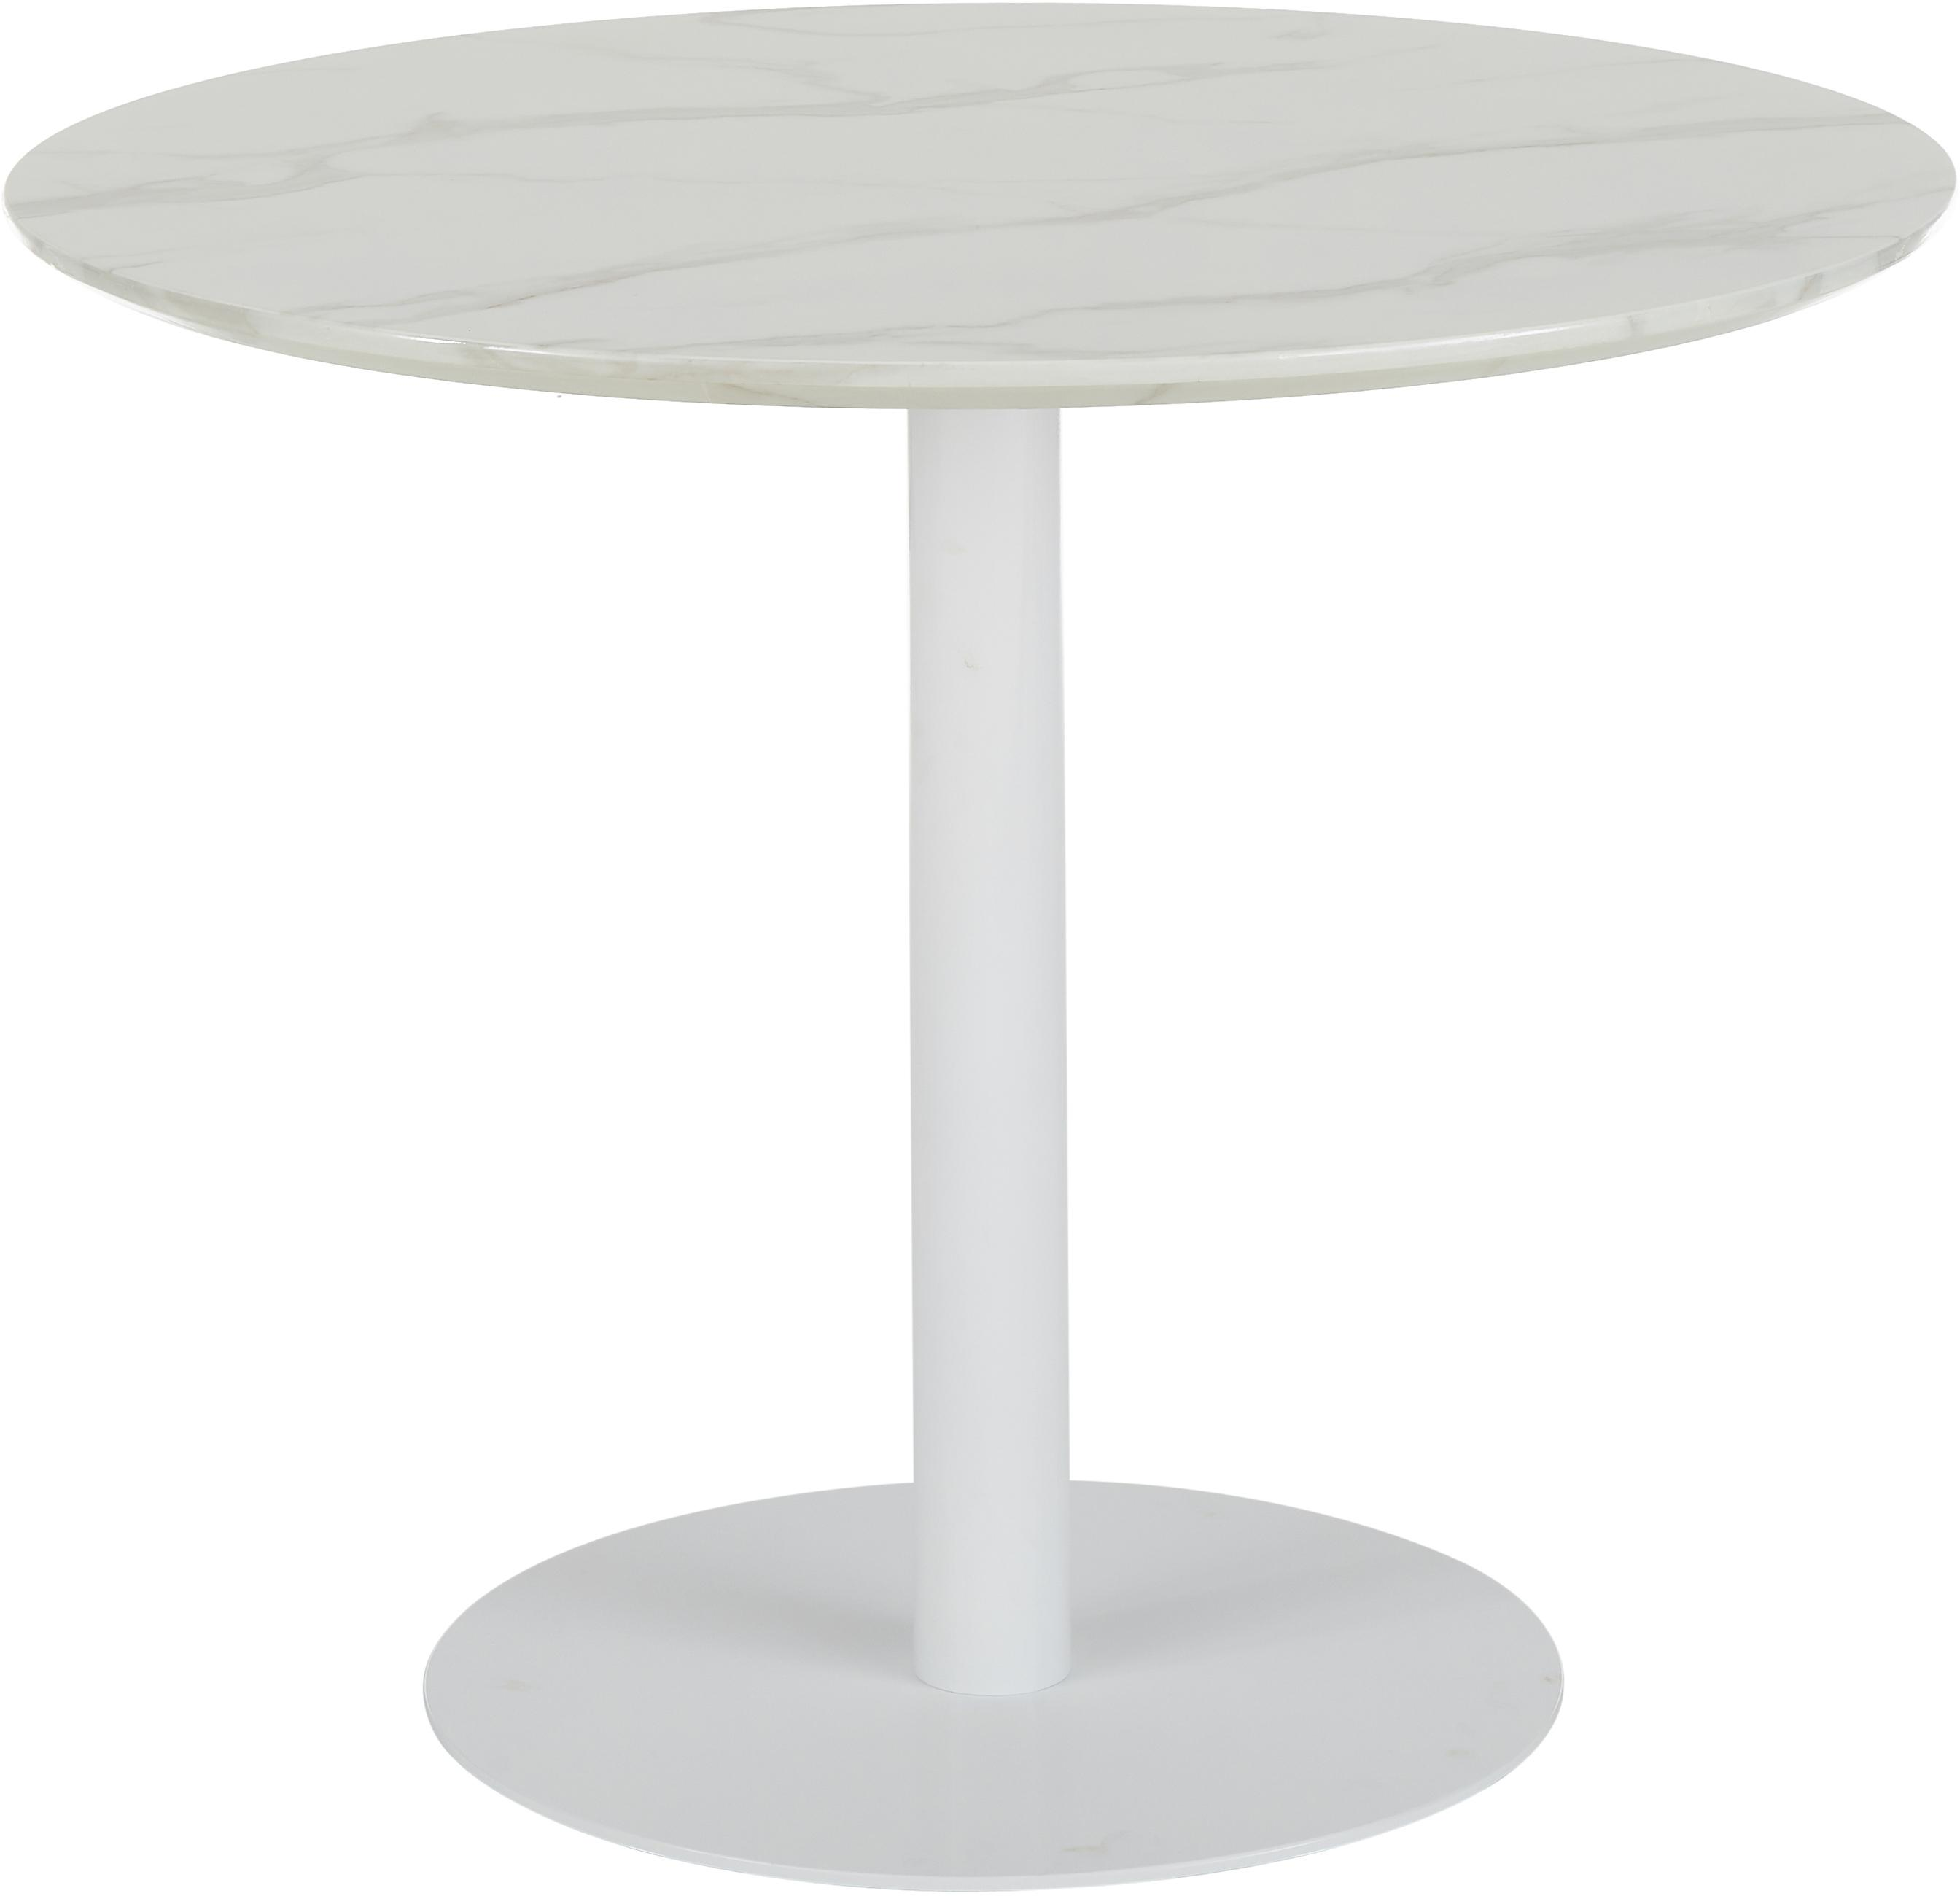 Table ronde blanche Karla, Plateau: blanc, marbré Pied: blanc, mat